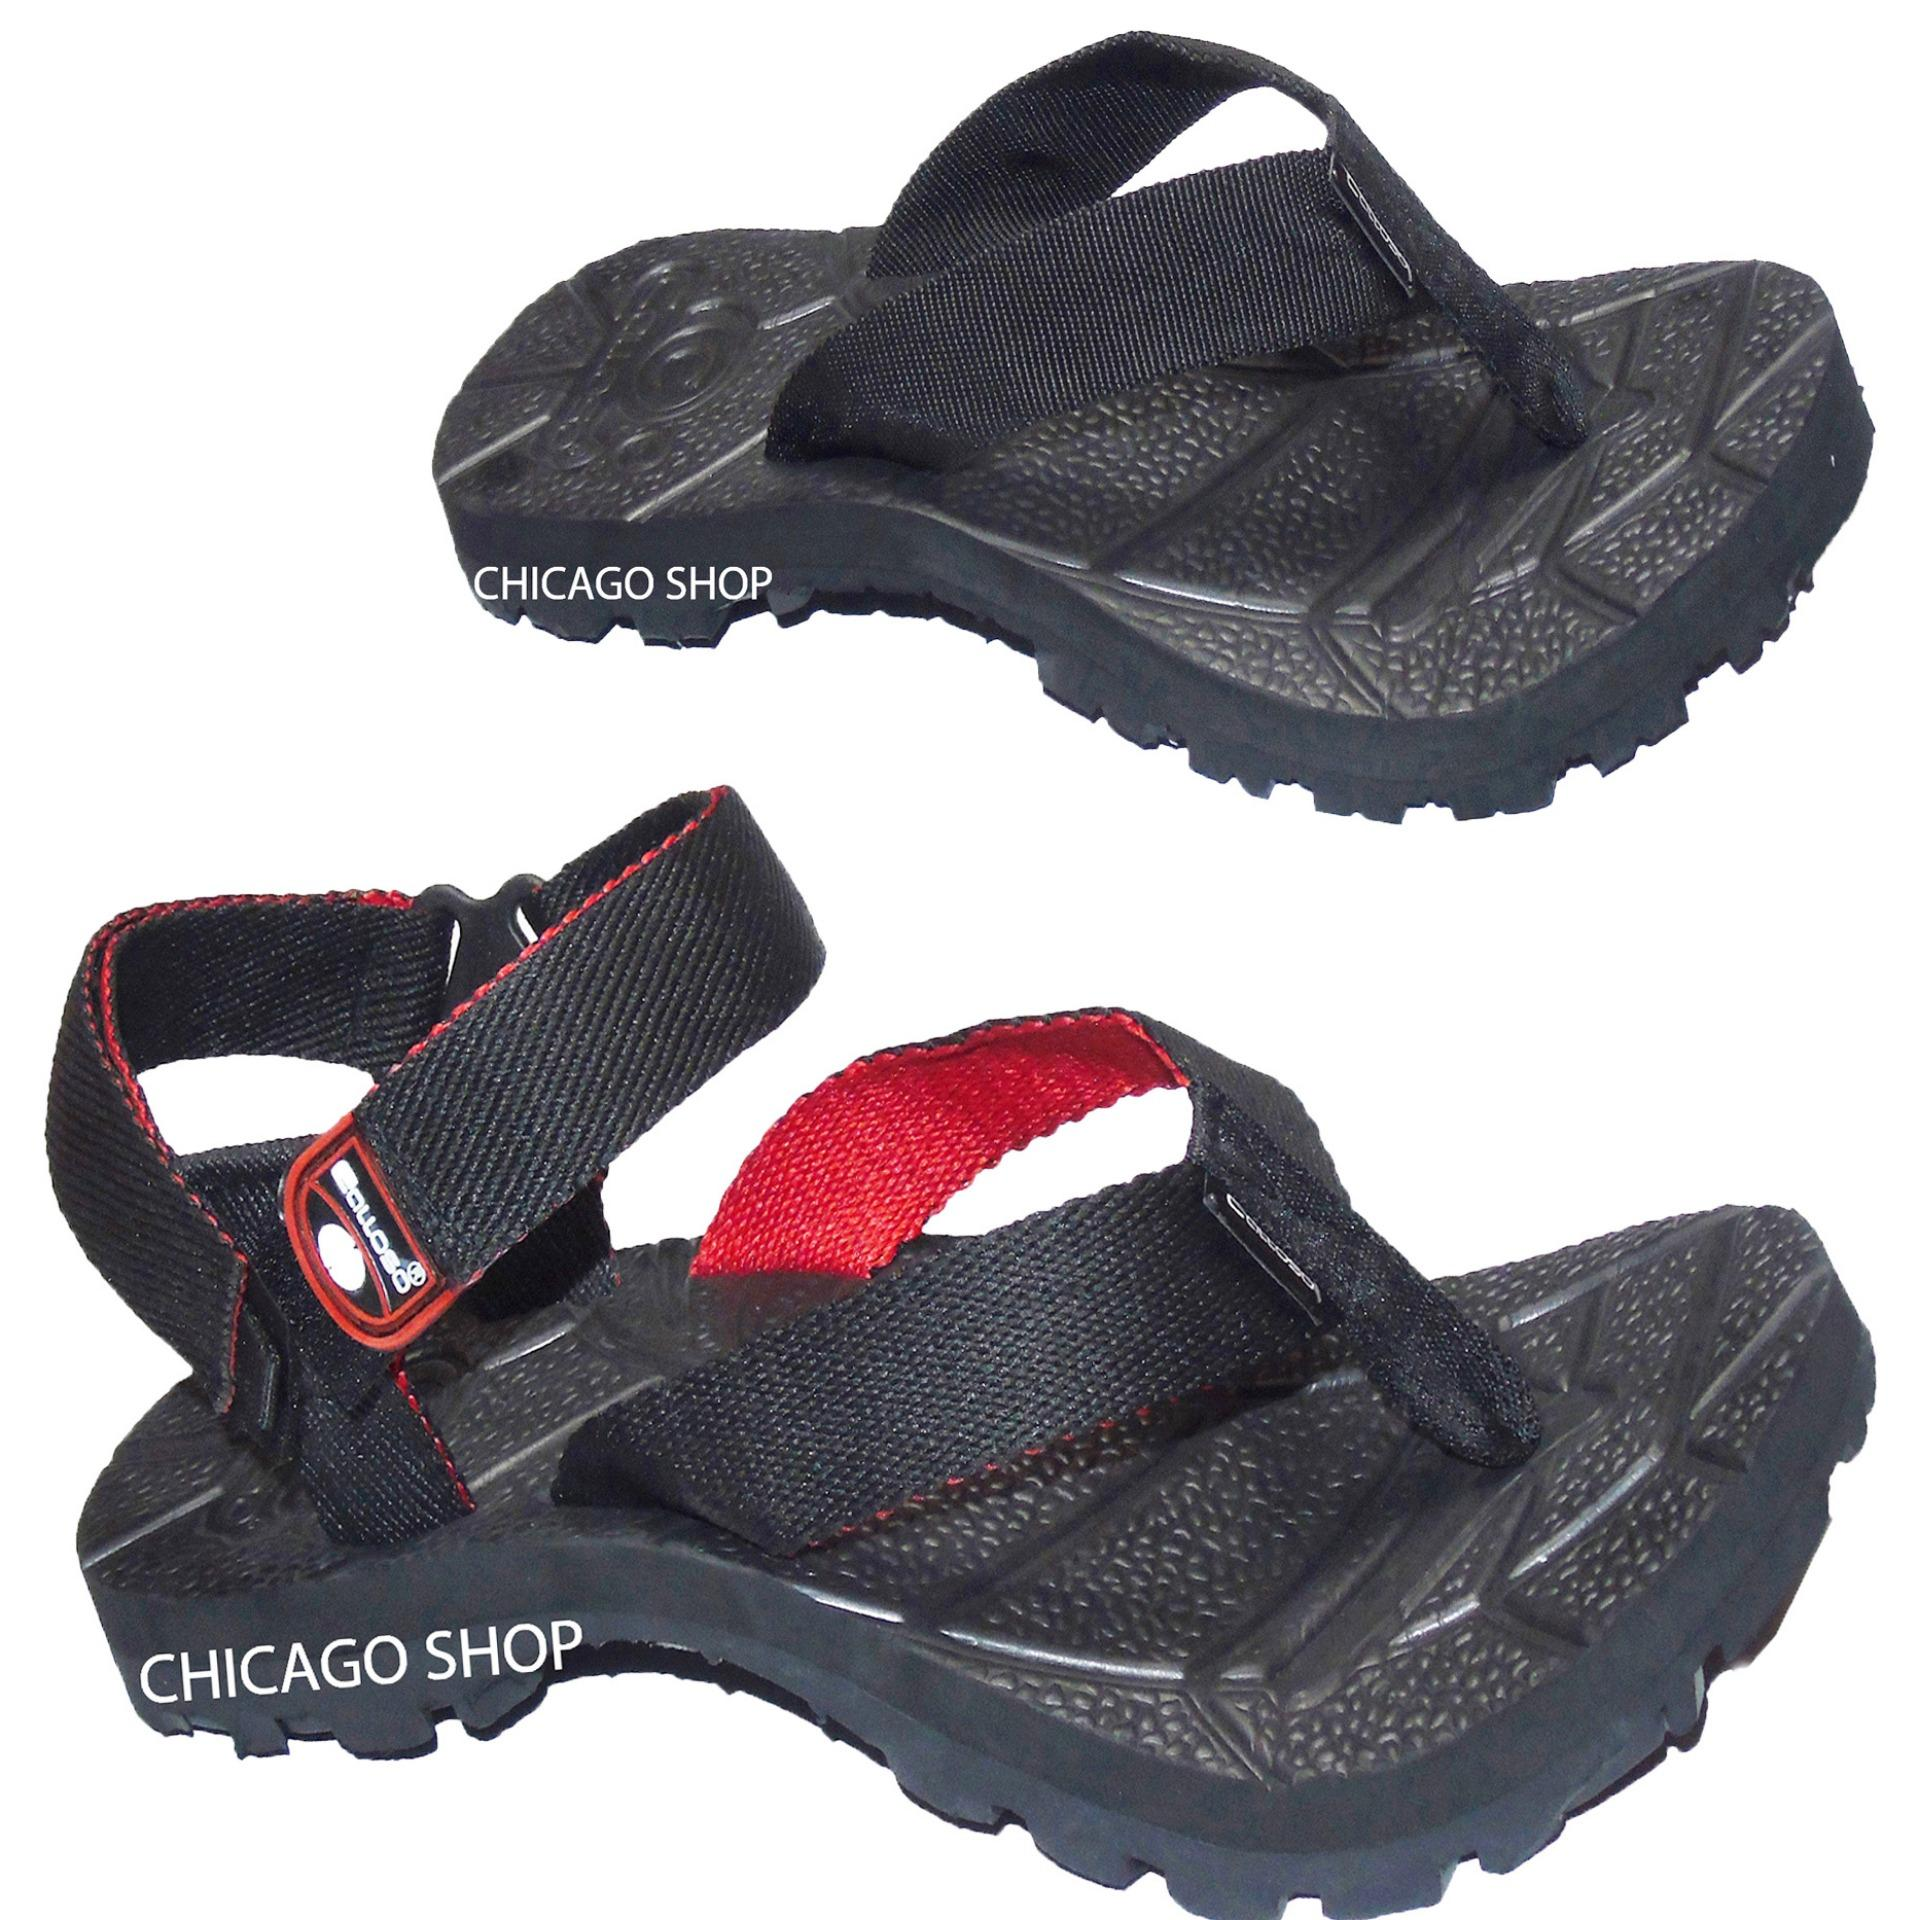 Aldhino Collection Boots Dn 016 Biru Spec Dan Daftar Harga Terbaru Sonne Alice Sc5006 Brown Premium Lady Comfort Leather Shoes Sepatu Kulit Pria 06 Htm New Best Buy Indonesia Source Sandal Gunung